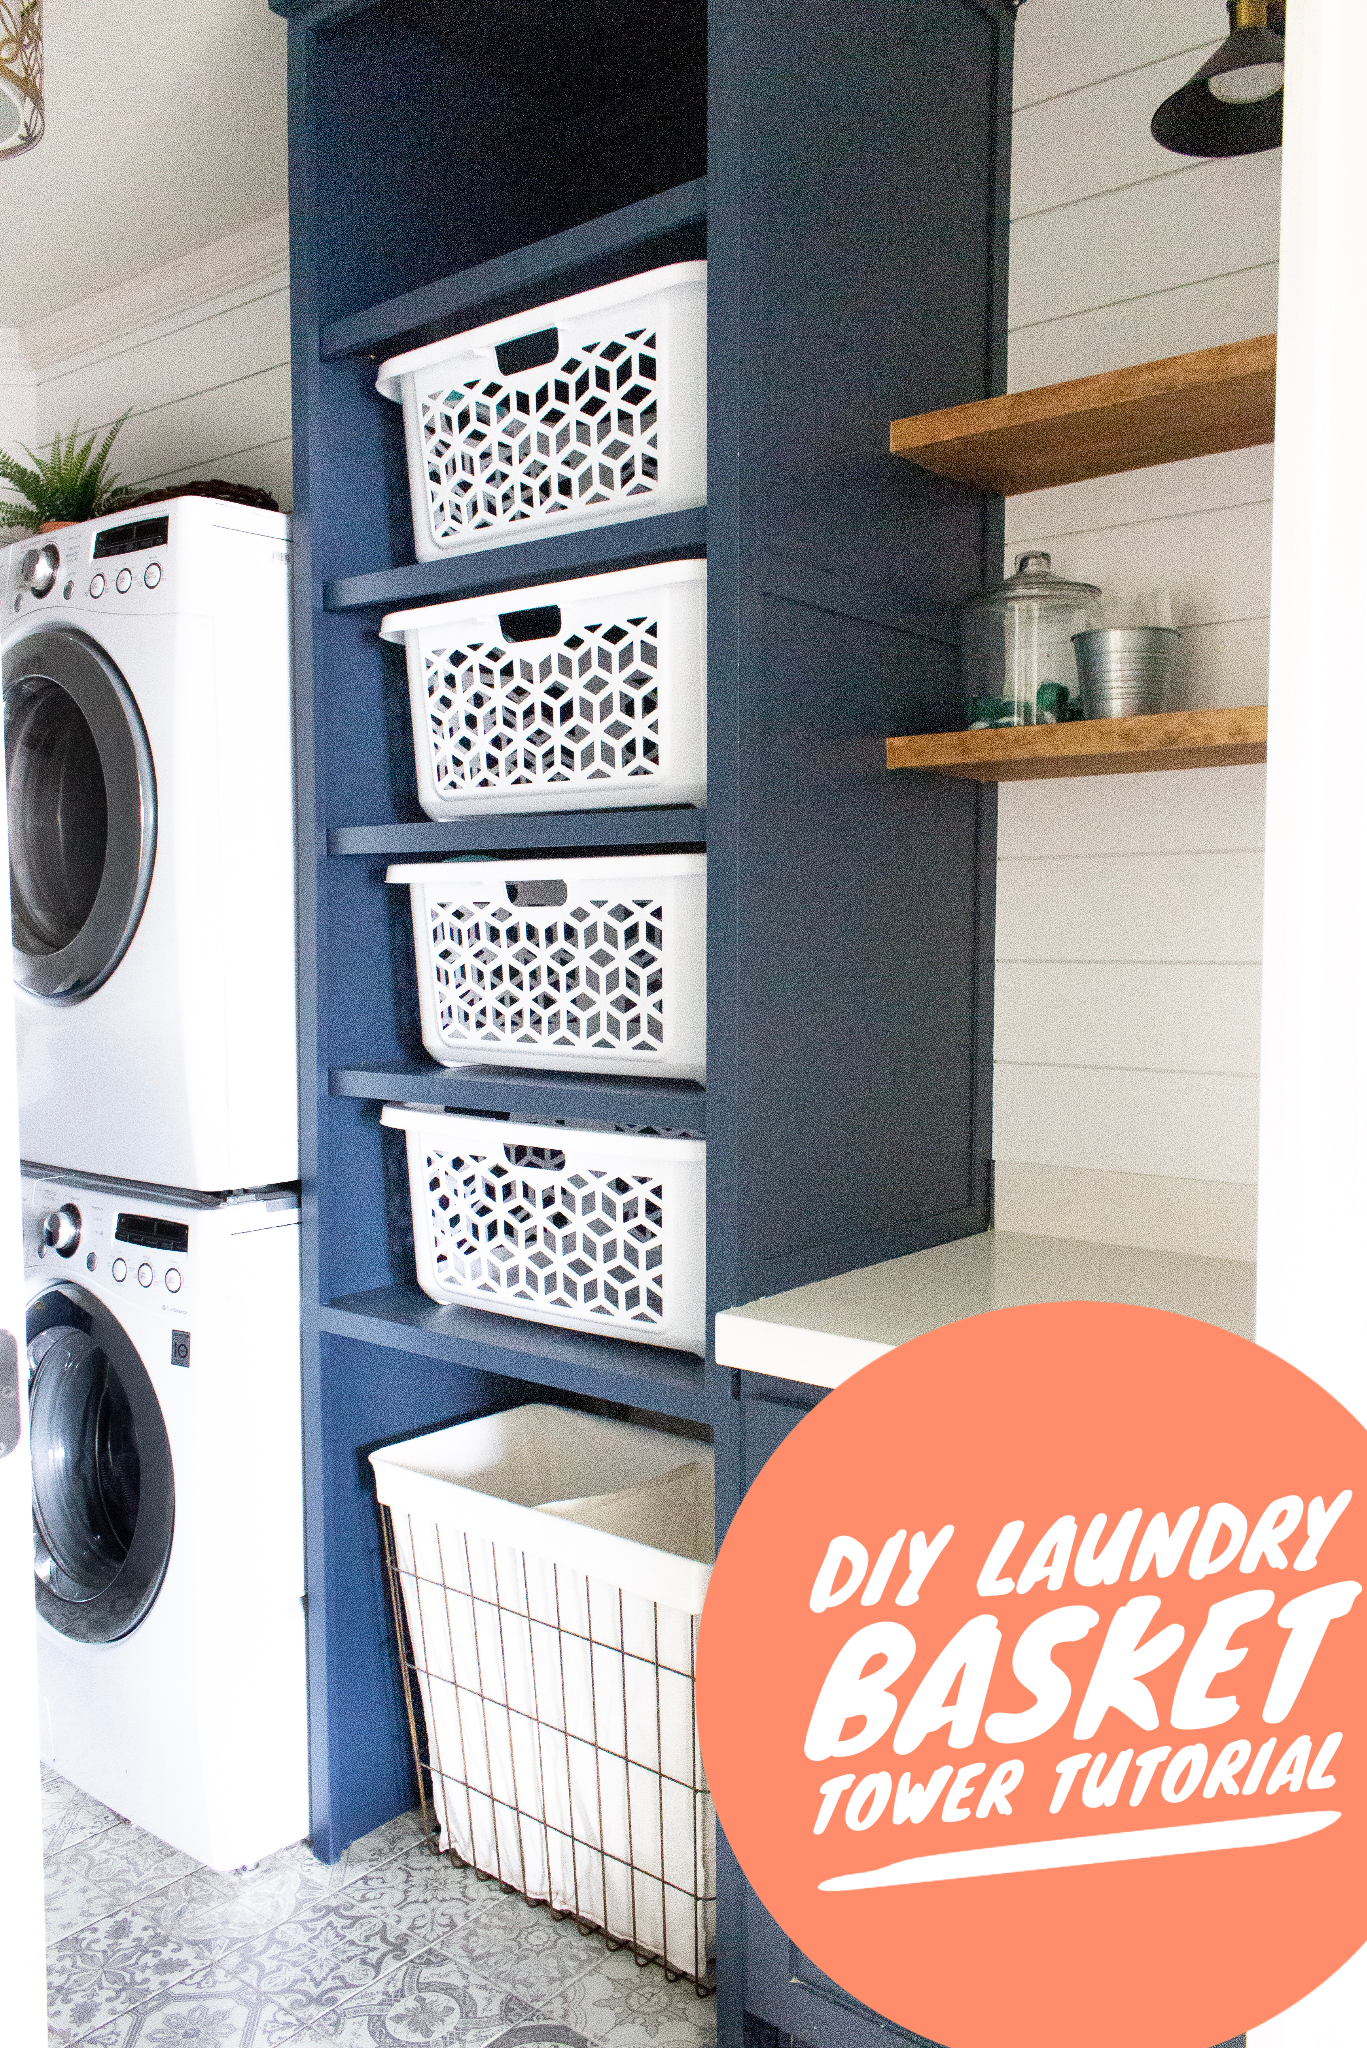 Diy Wasche Korb Turm Honig Built Hause Laundry Room Diy Diy Laundry Basket Laundry Room Layouts